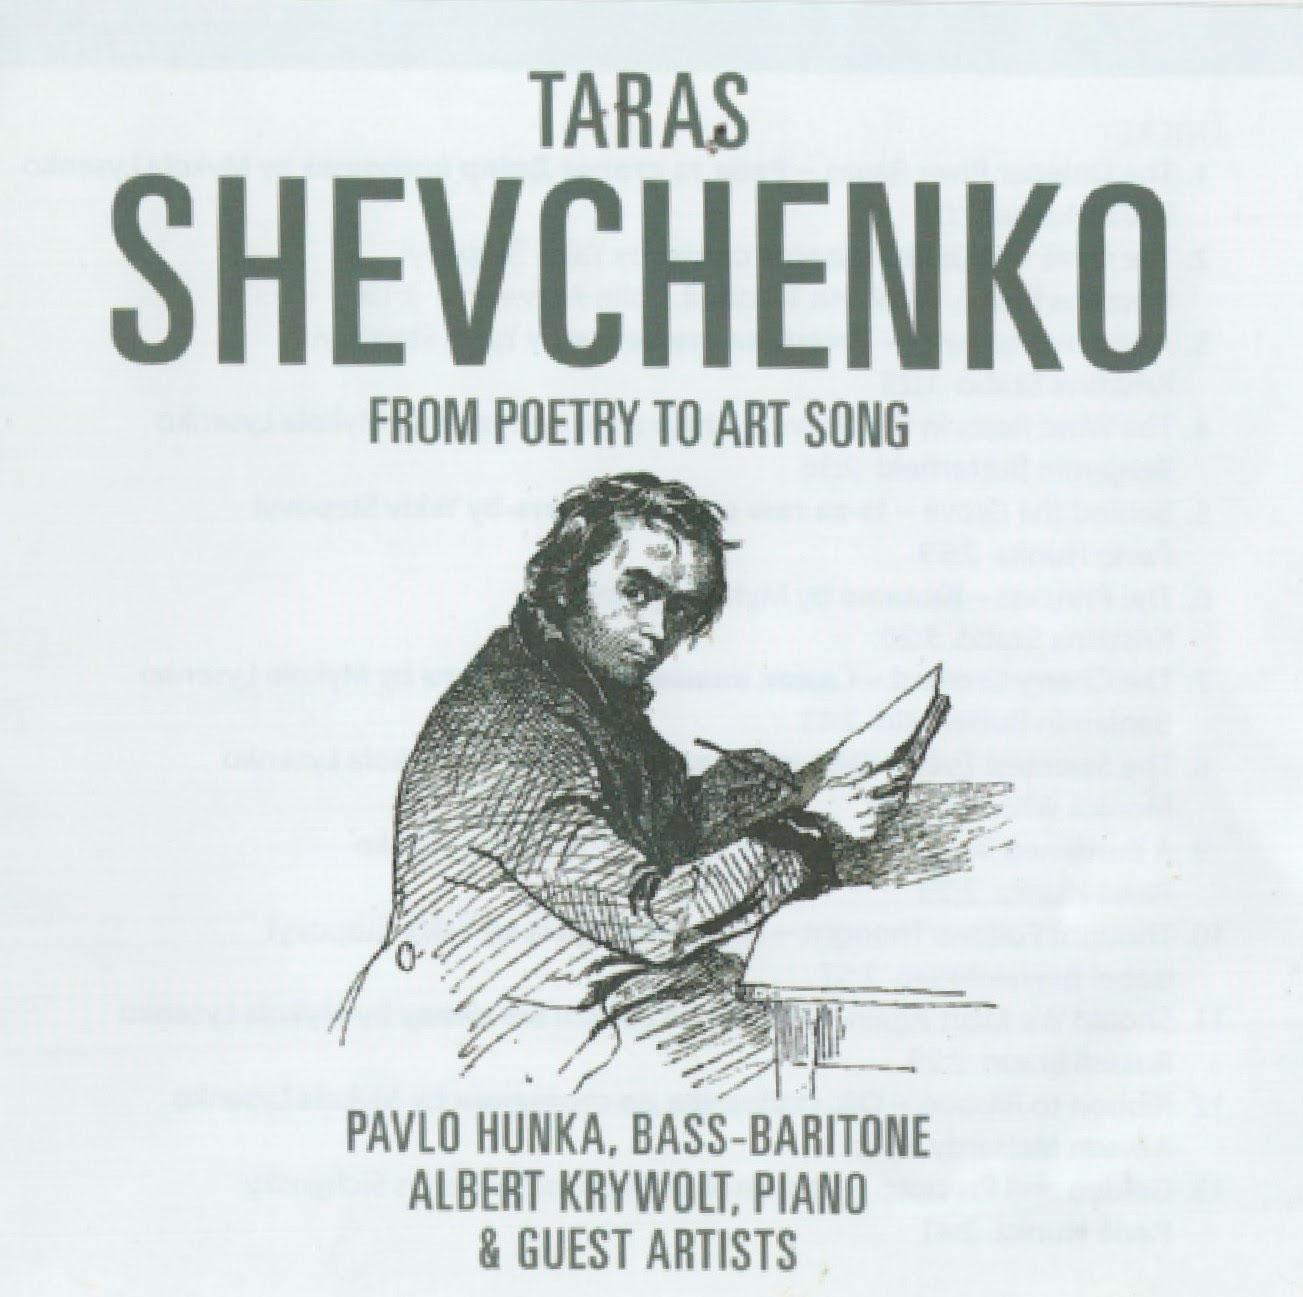 taras shevchenko cd cover